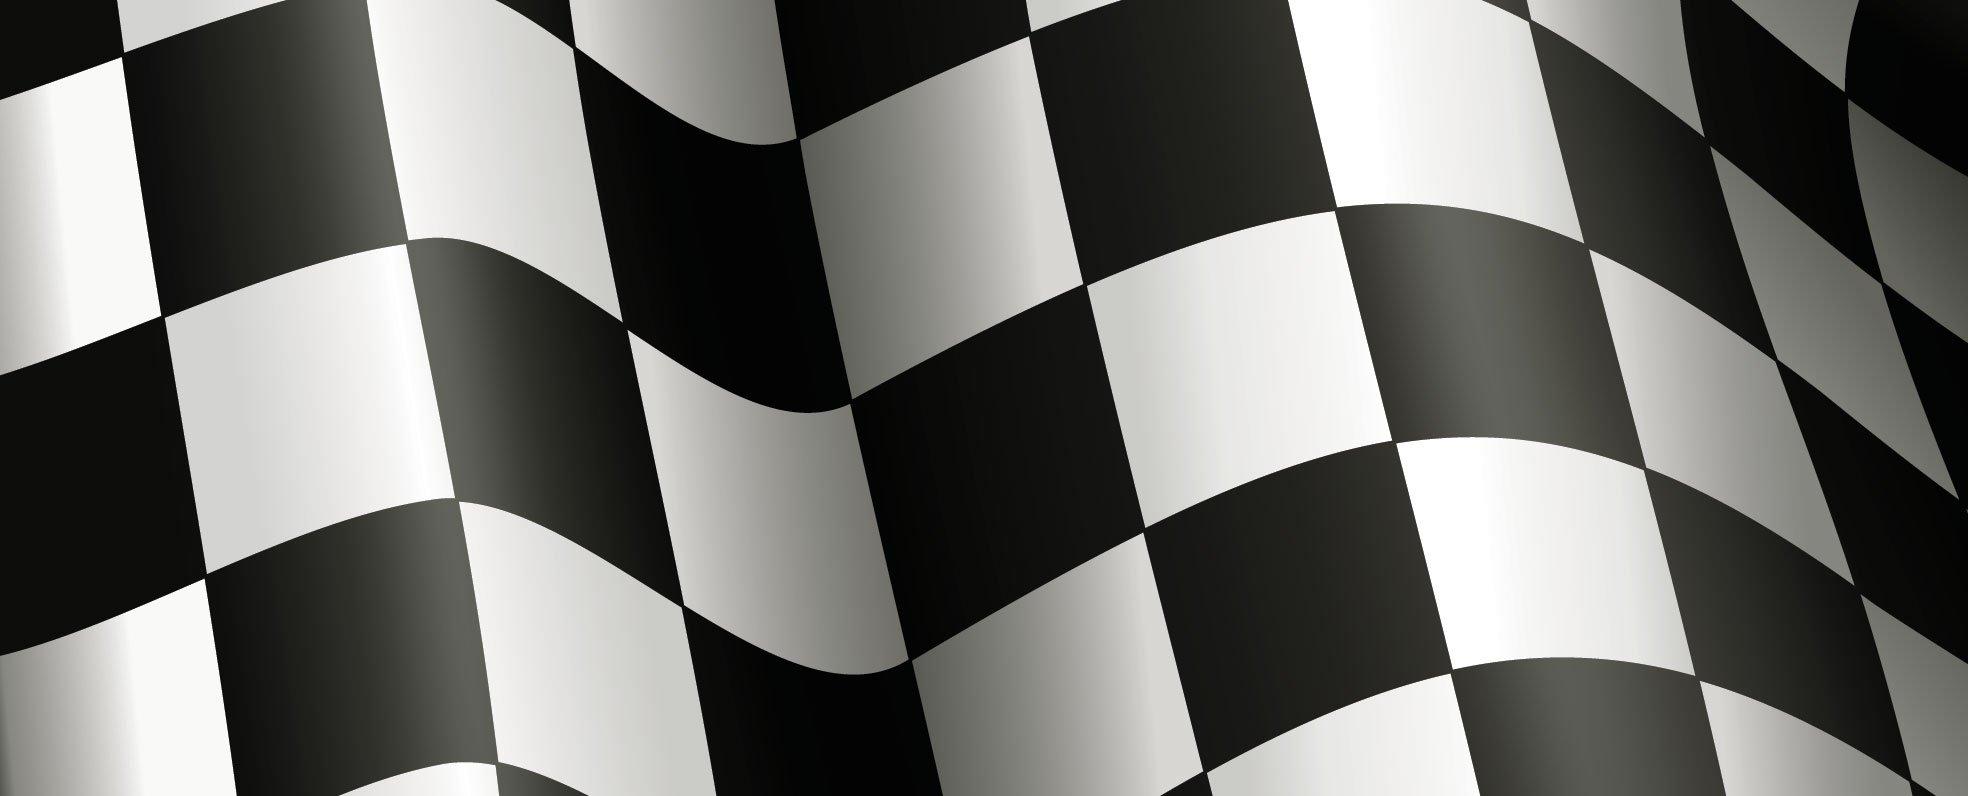 29+ Waving Checkered Flag Wallpaper Background